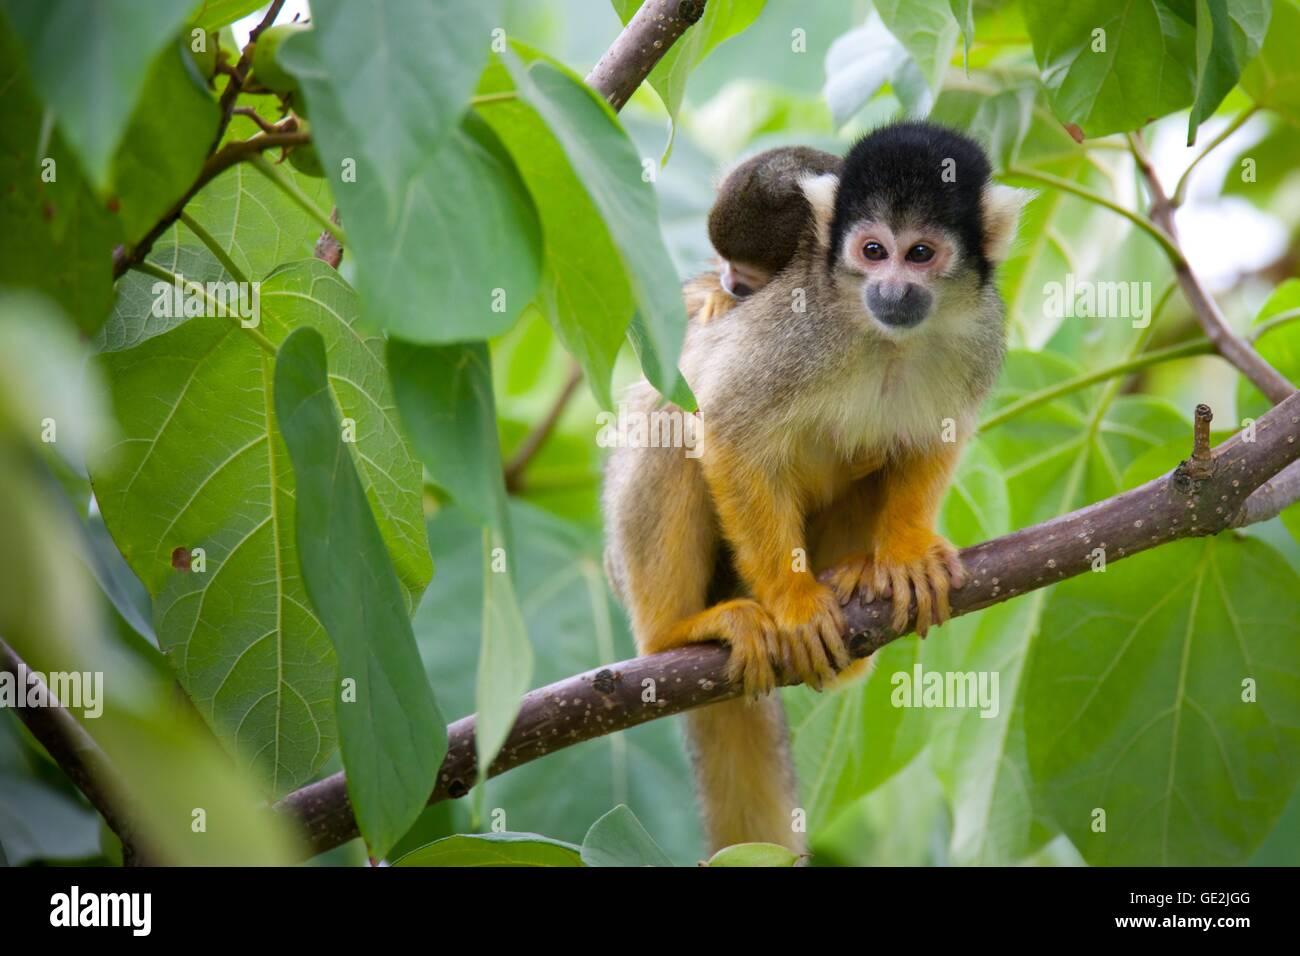 squirrel monkeys - Stock Image